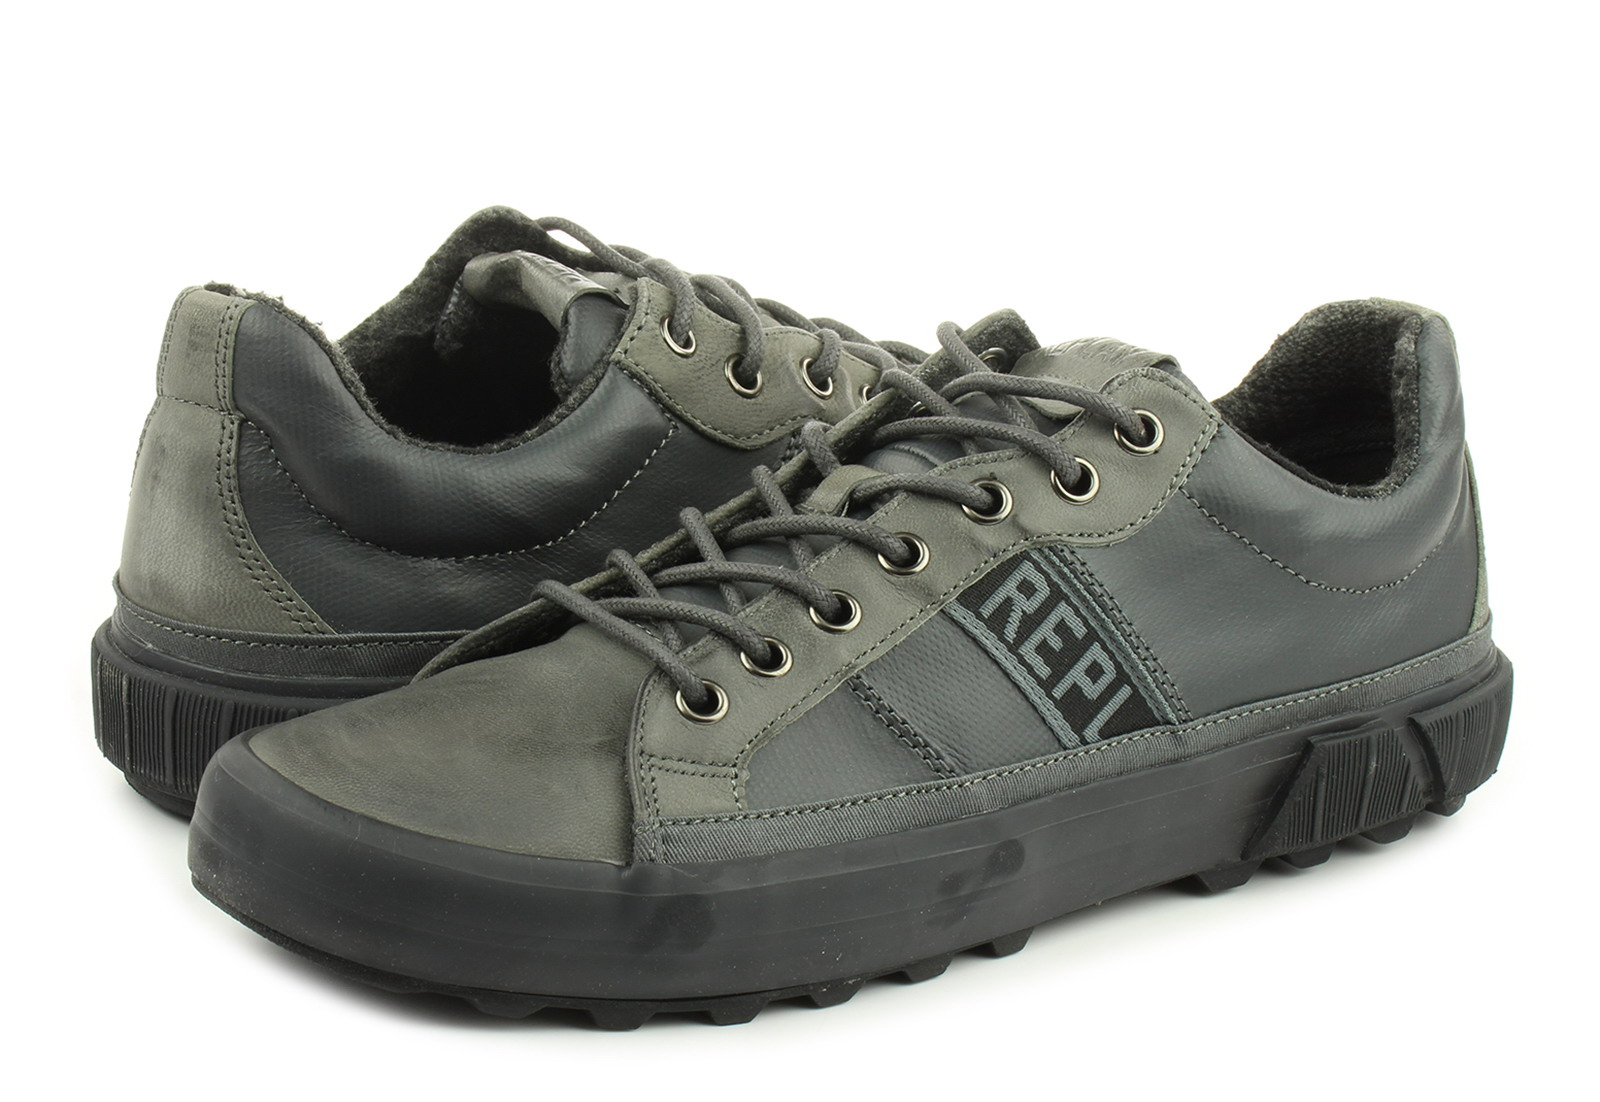 Replay Cipő - Rv760013s - RV760013S-0019 - Office Shoes Magyarország 81f95a120f